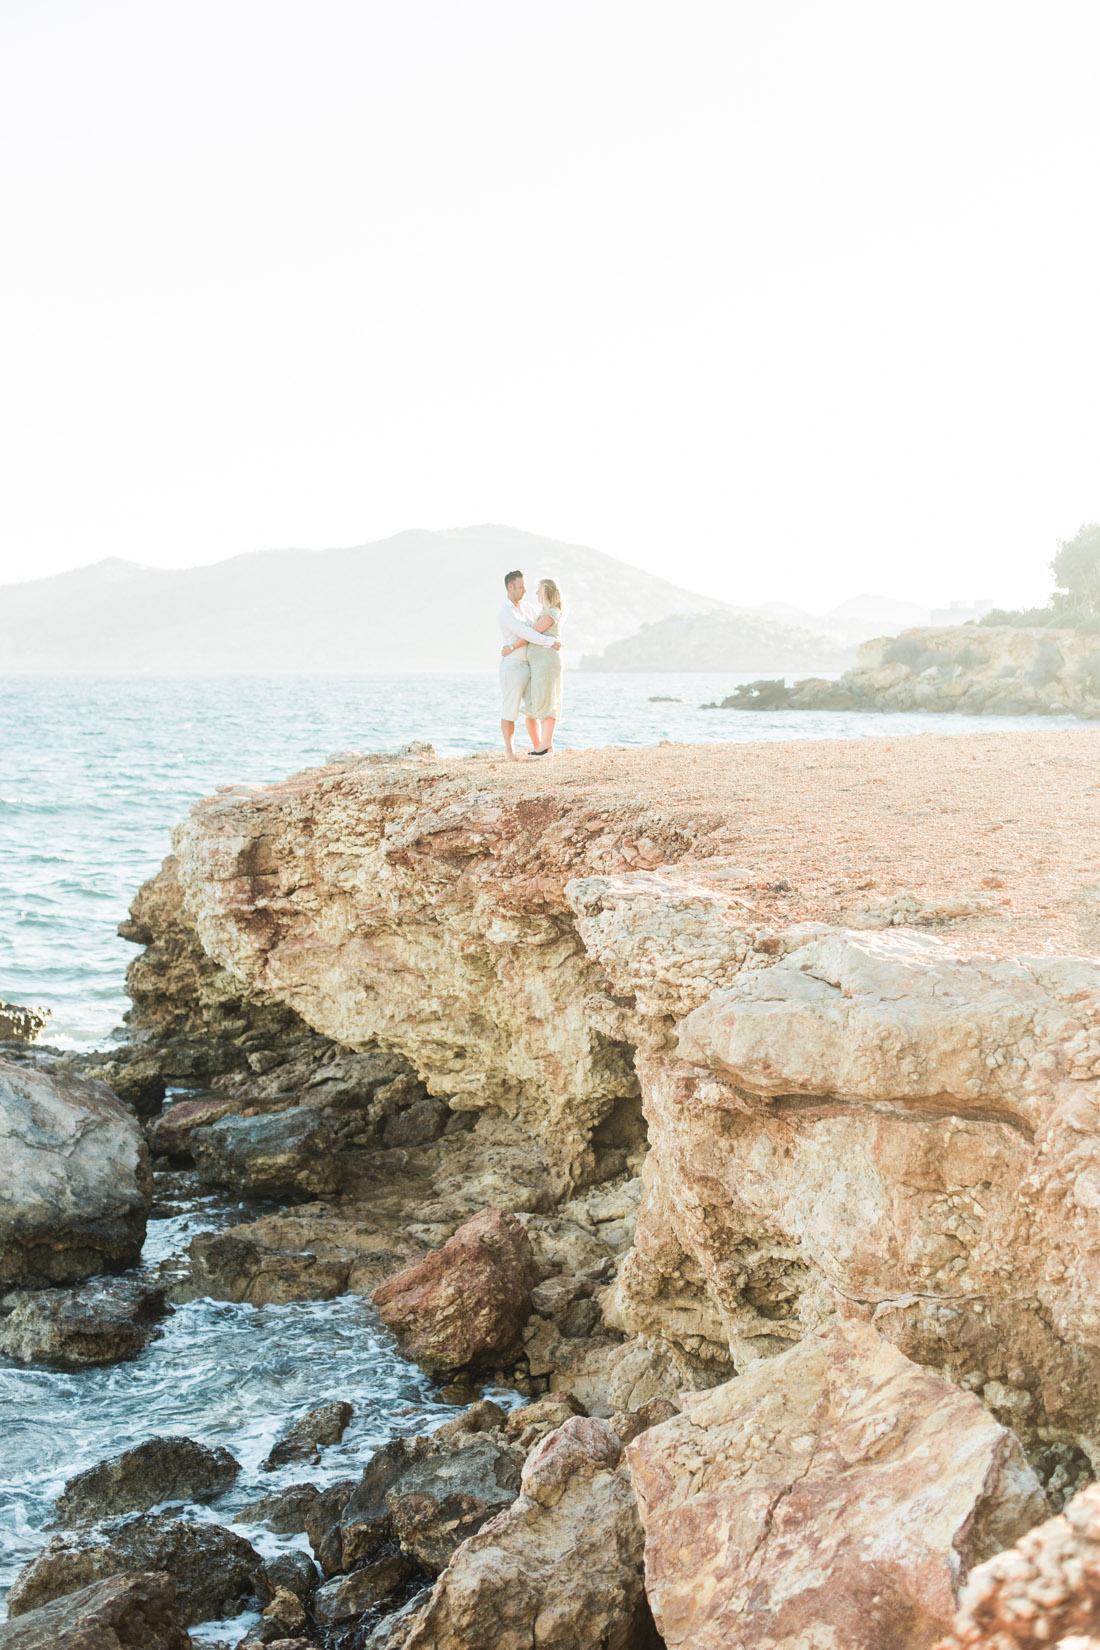 Maternity Pregnant Photoshoot shoot Fotoshoot Spain Ibiza fotograaf photographer zwangerschapsshoot strand rotsen Santa Eularia des Riu zonsondergang sunset Spanje Fine Art bruidsfotograaf Espanha fotografo Portugal algarve fotografia